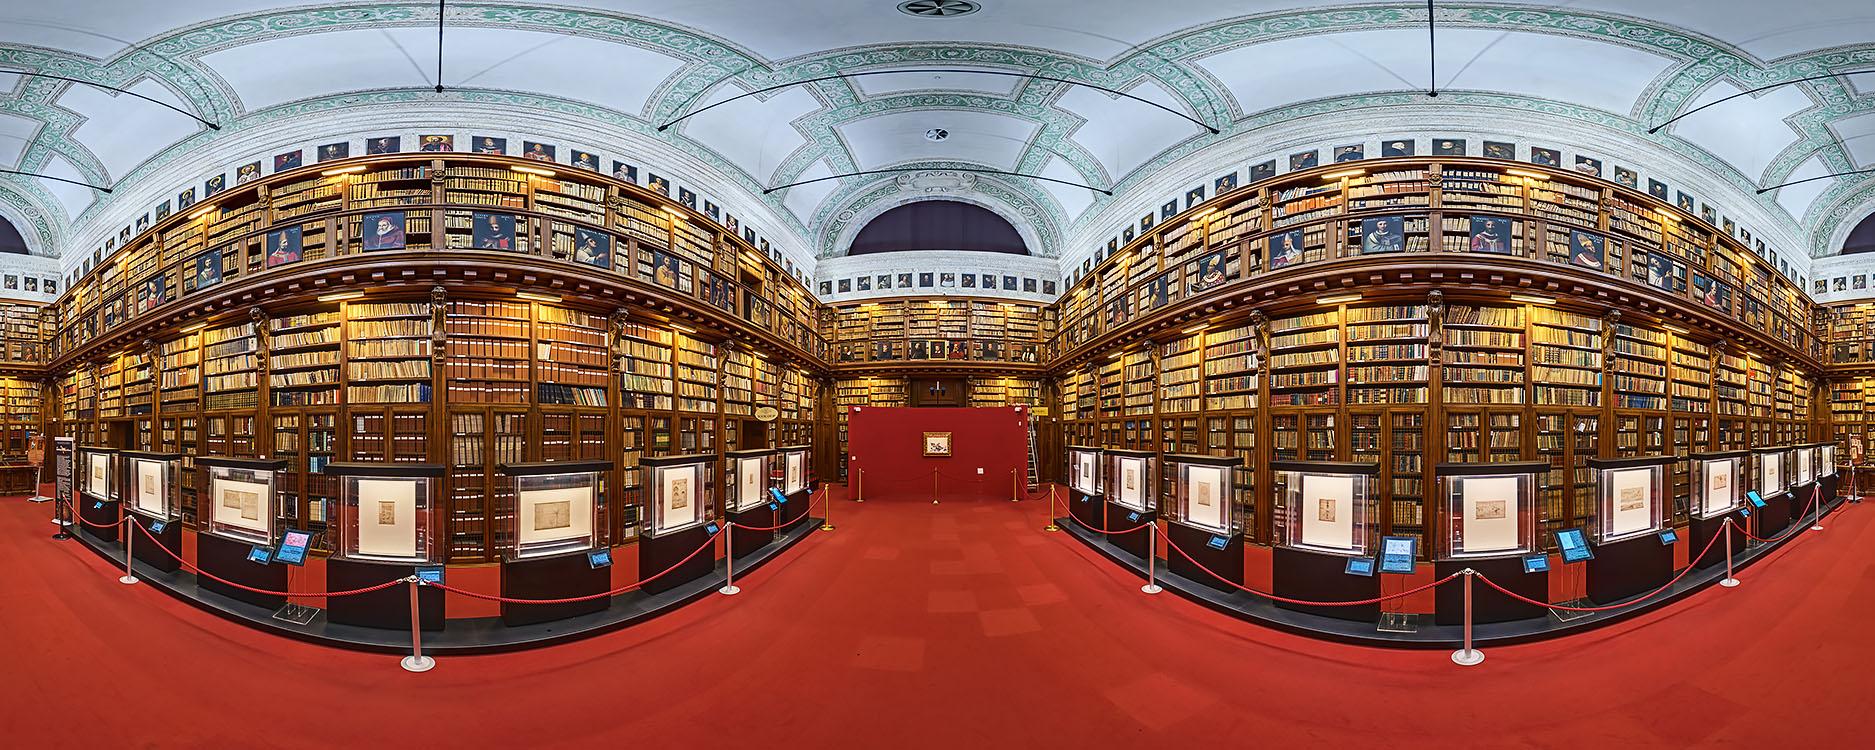 The great Federiciana Hall featuring the Codex Atlanticus by Leonardo Da Vinci